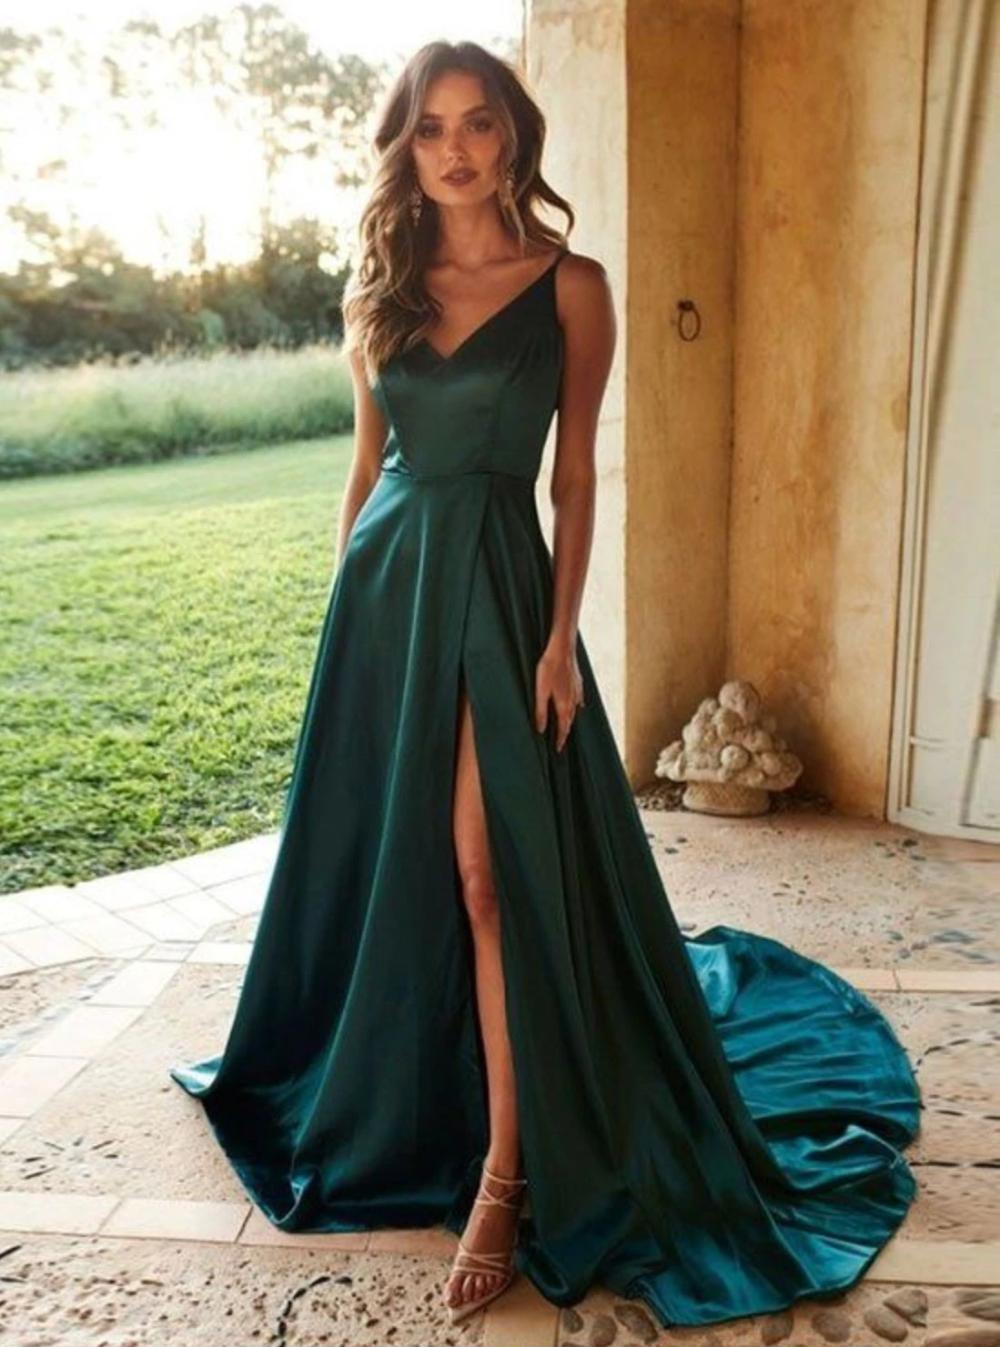 V Neck Side Slit Sexy Long Prom Dresses Green Formal Gown